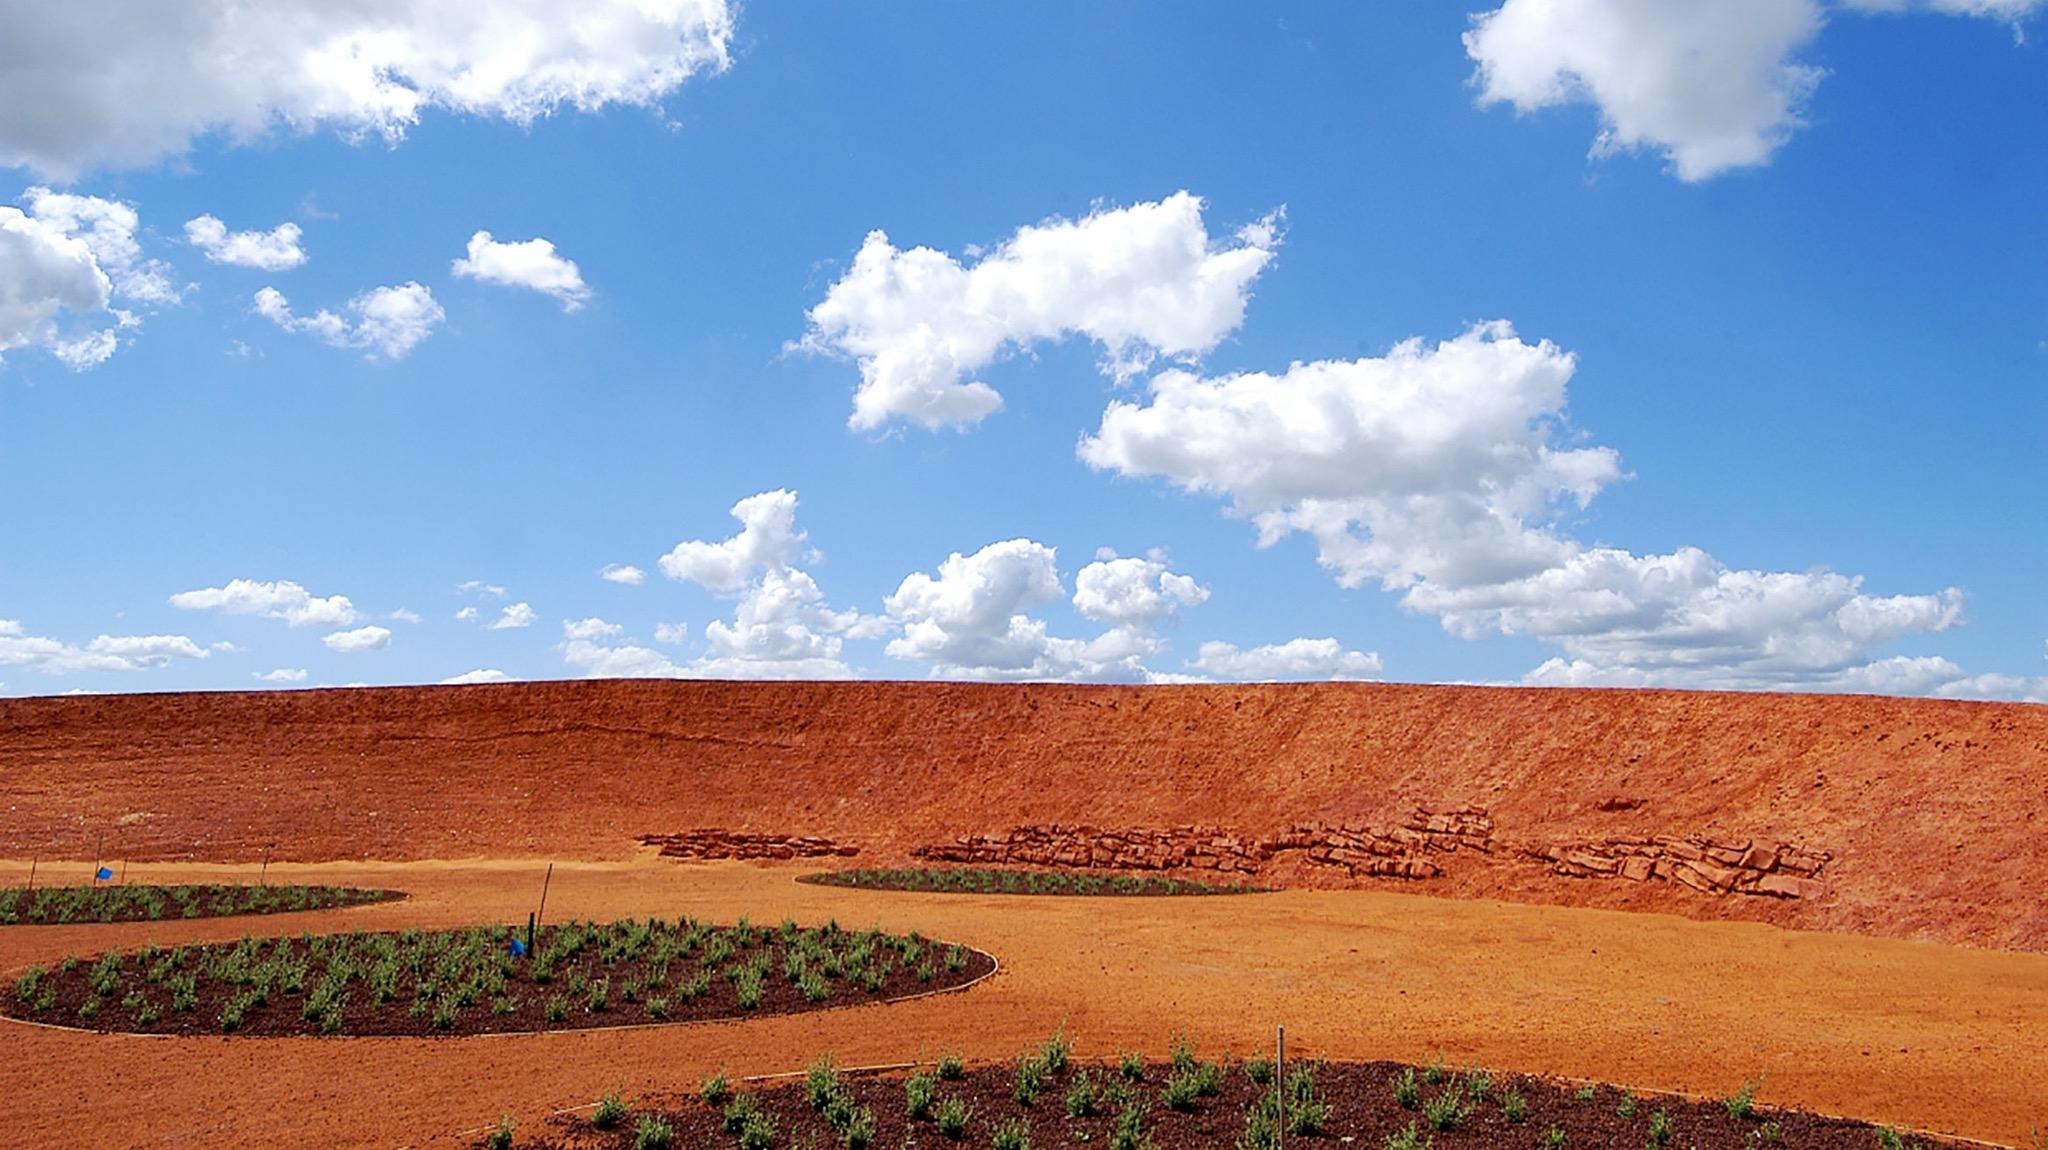 The Red Sand Garden